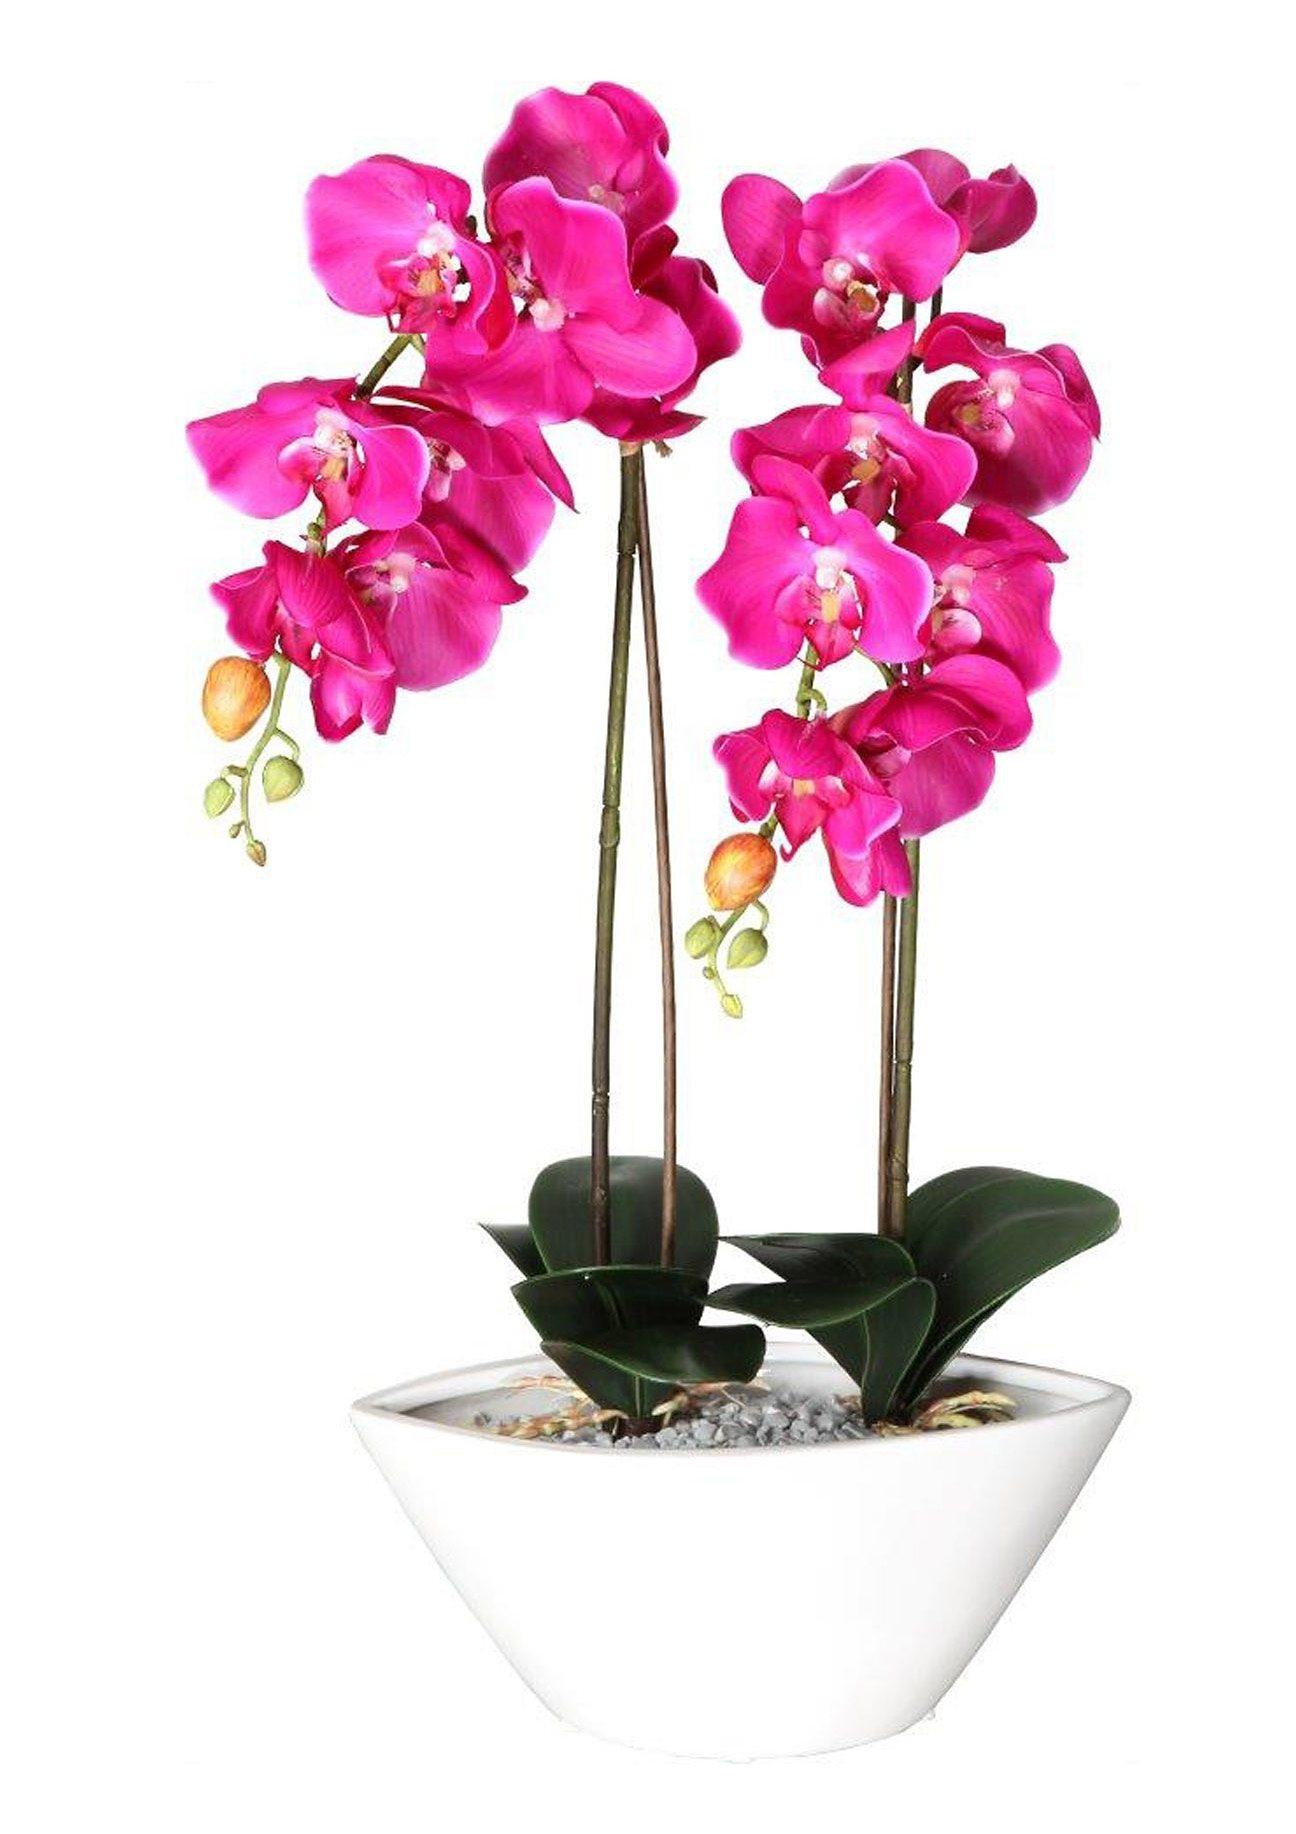 Home affaire Kunstblume »Deko-Orchidee«